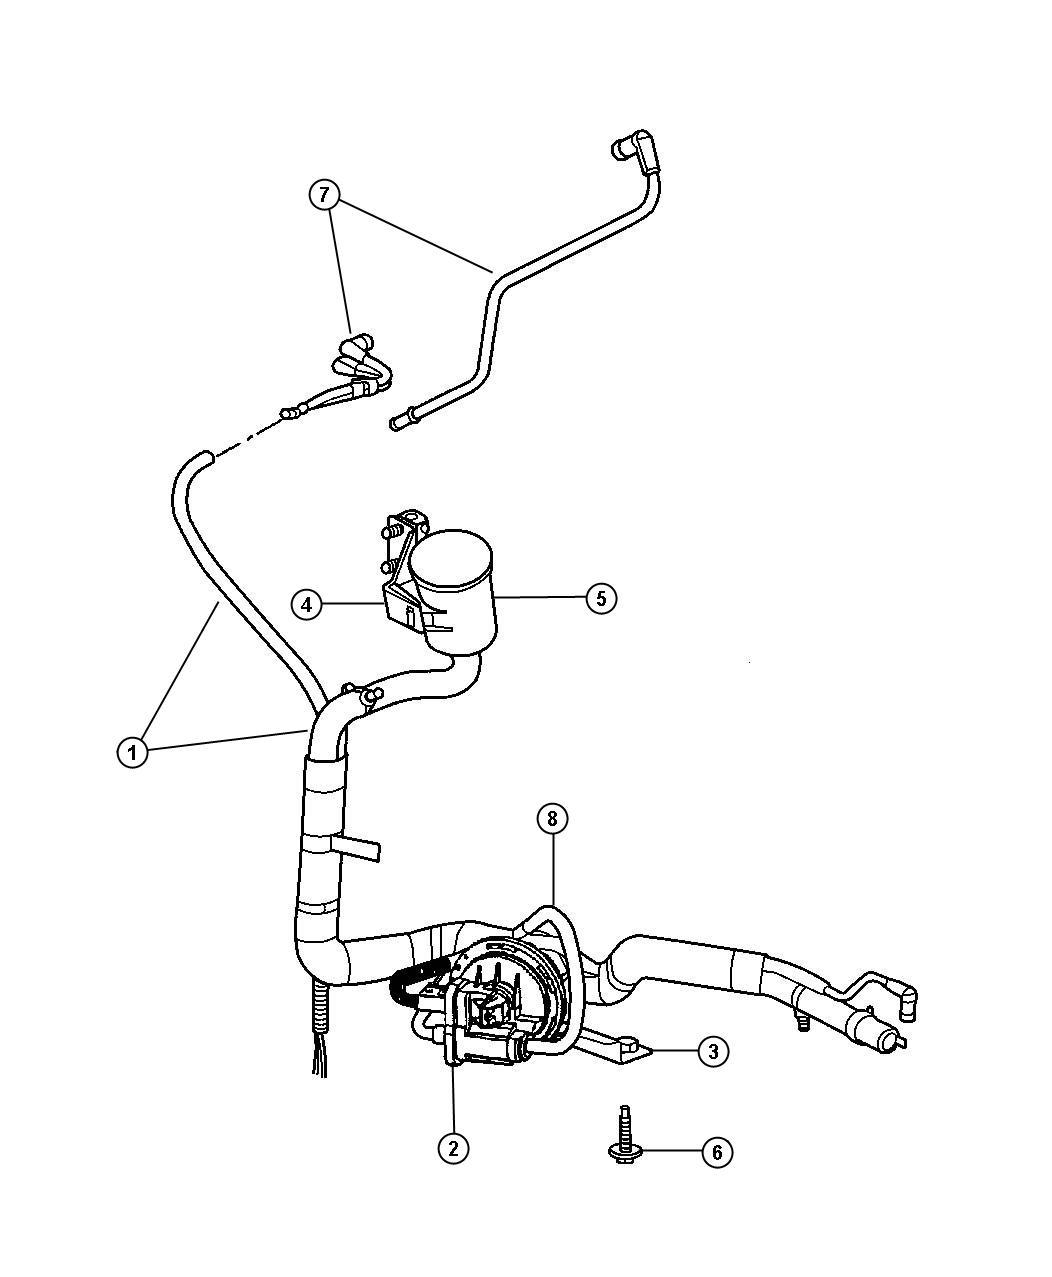 2002 Chrysler Voyager Harness. Leak detection pump to